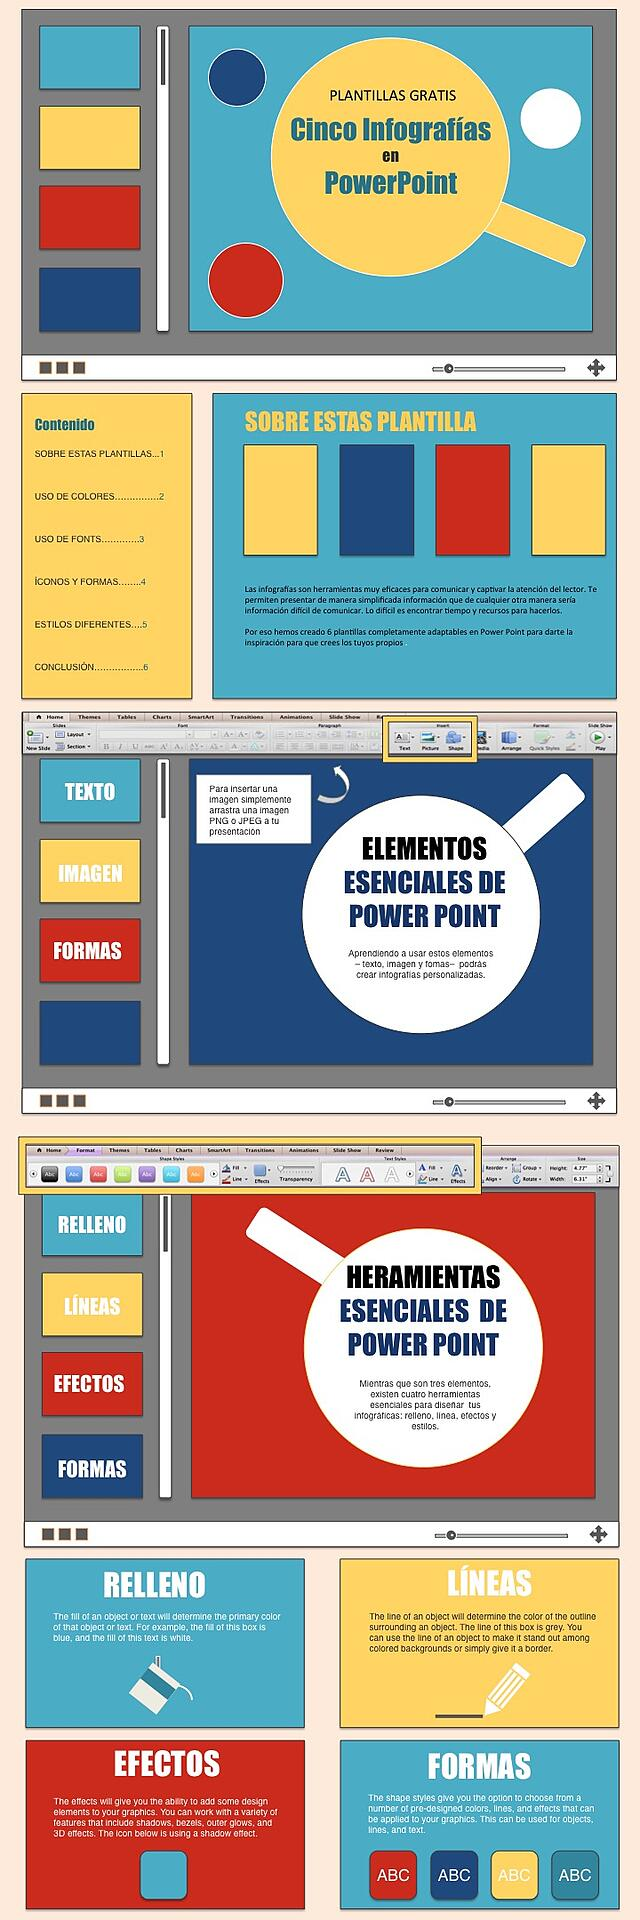 plantillas gratis para hacer infografías en Power Point